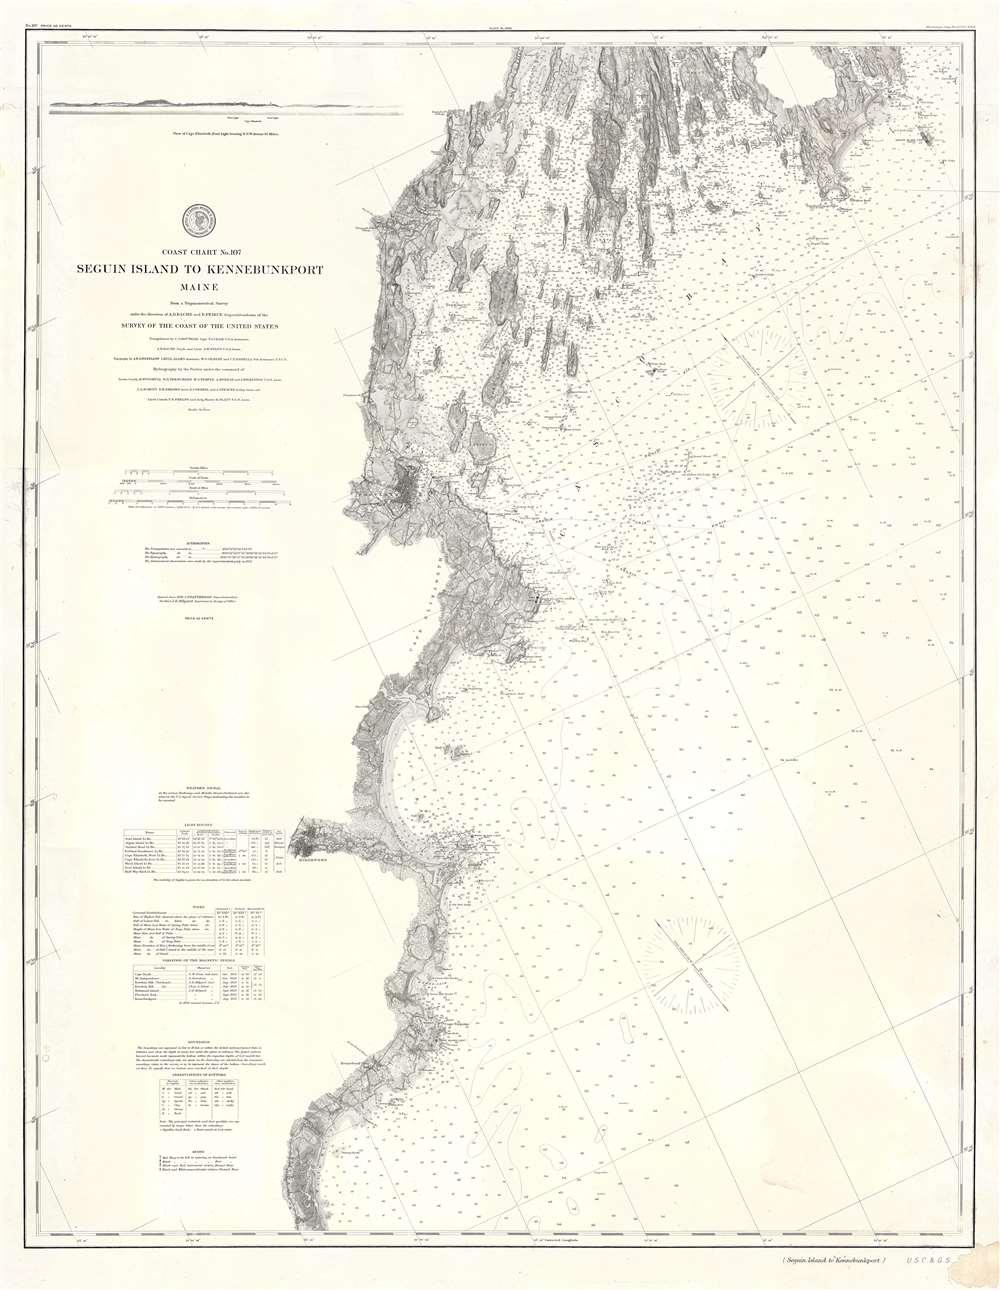 Coast Chart No. 107 Seguin Island to Kennebunkport Maine. - Main View